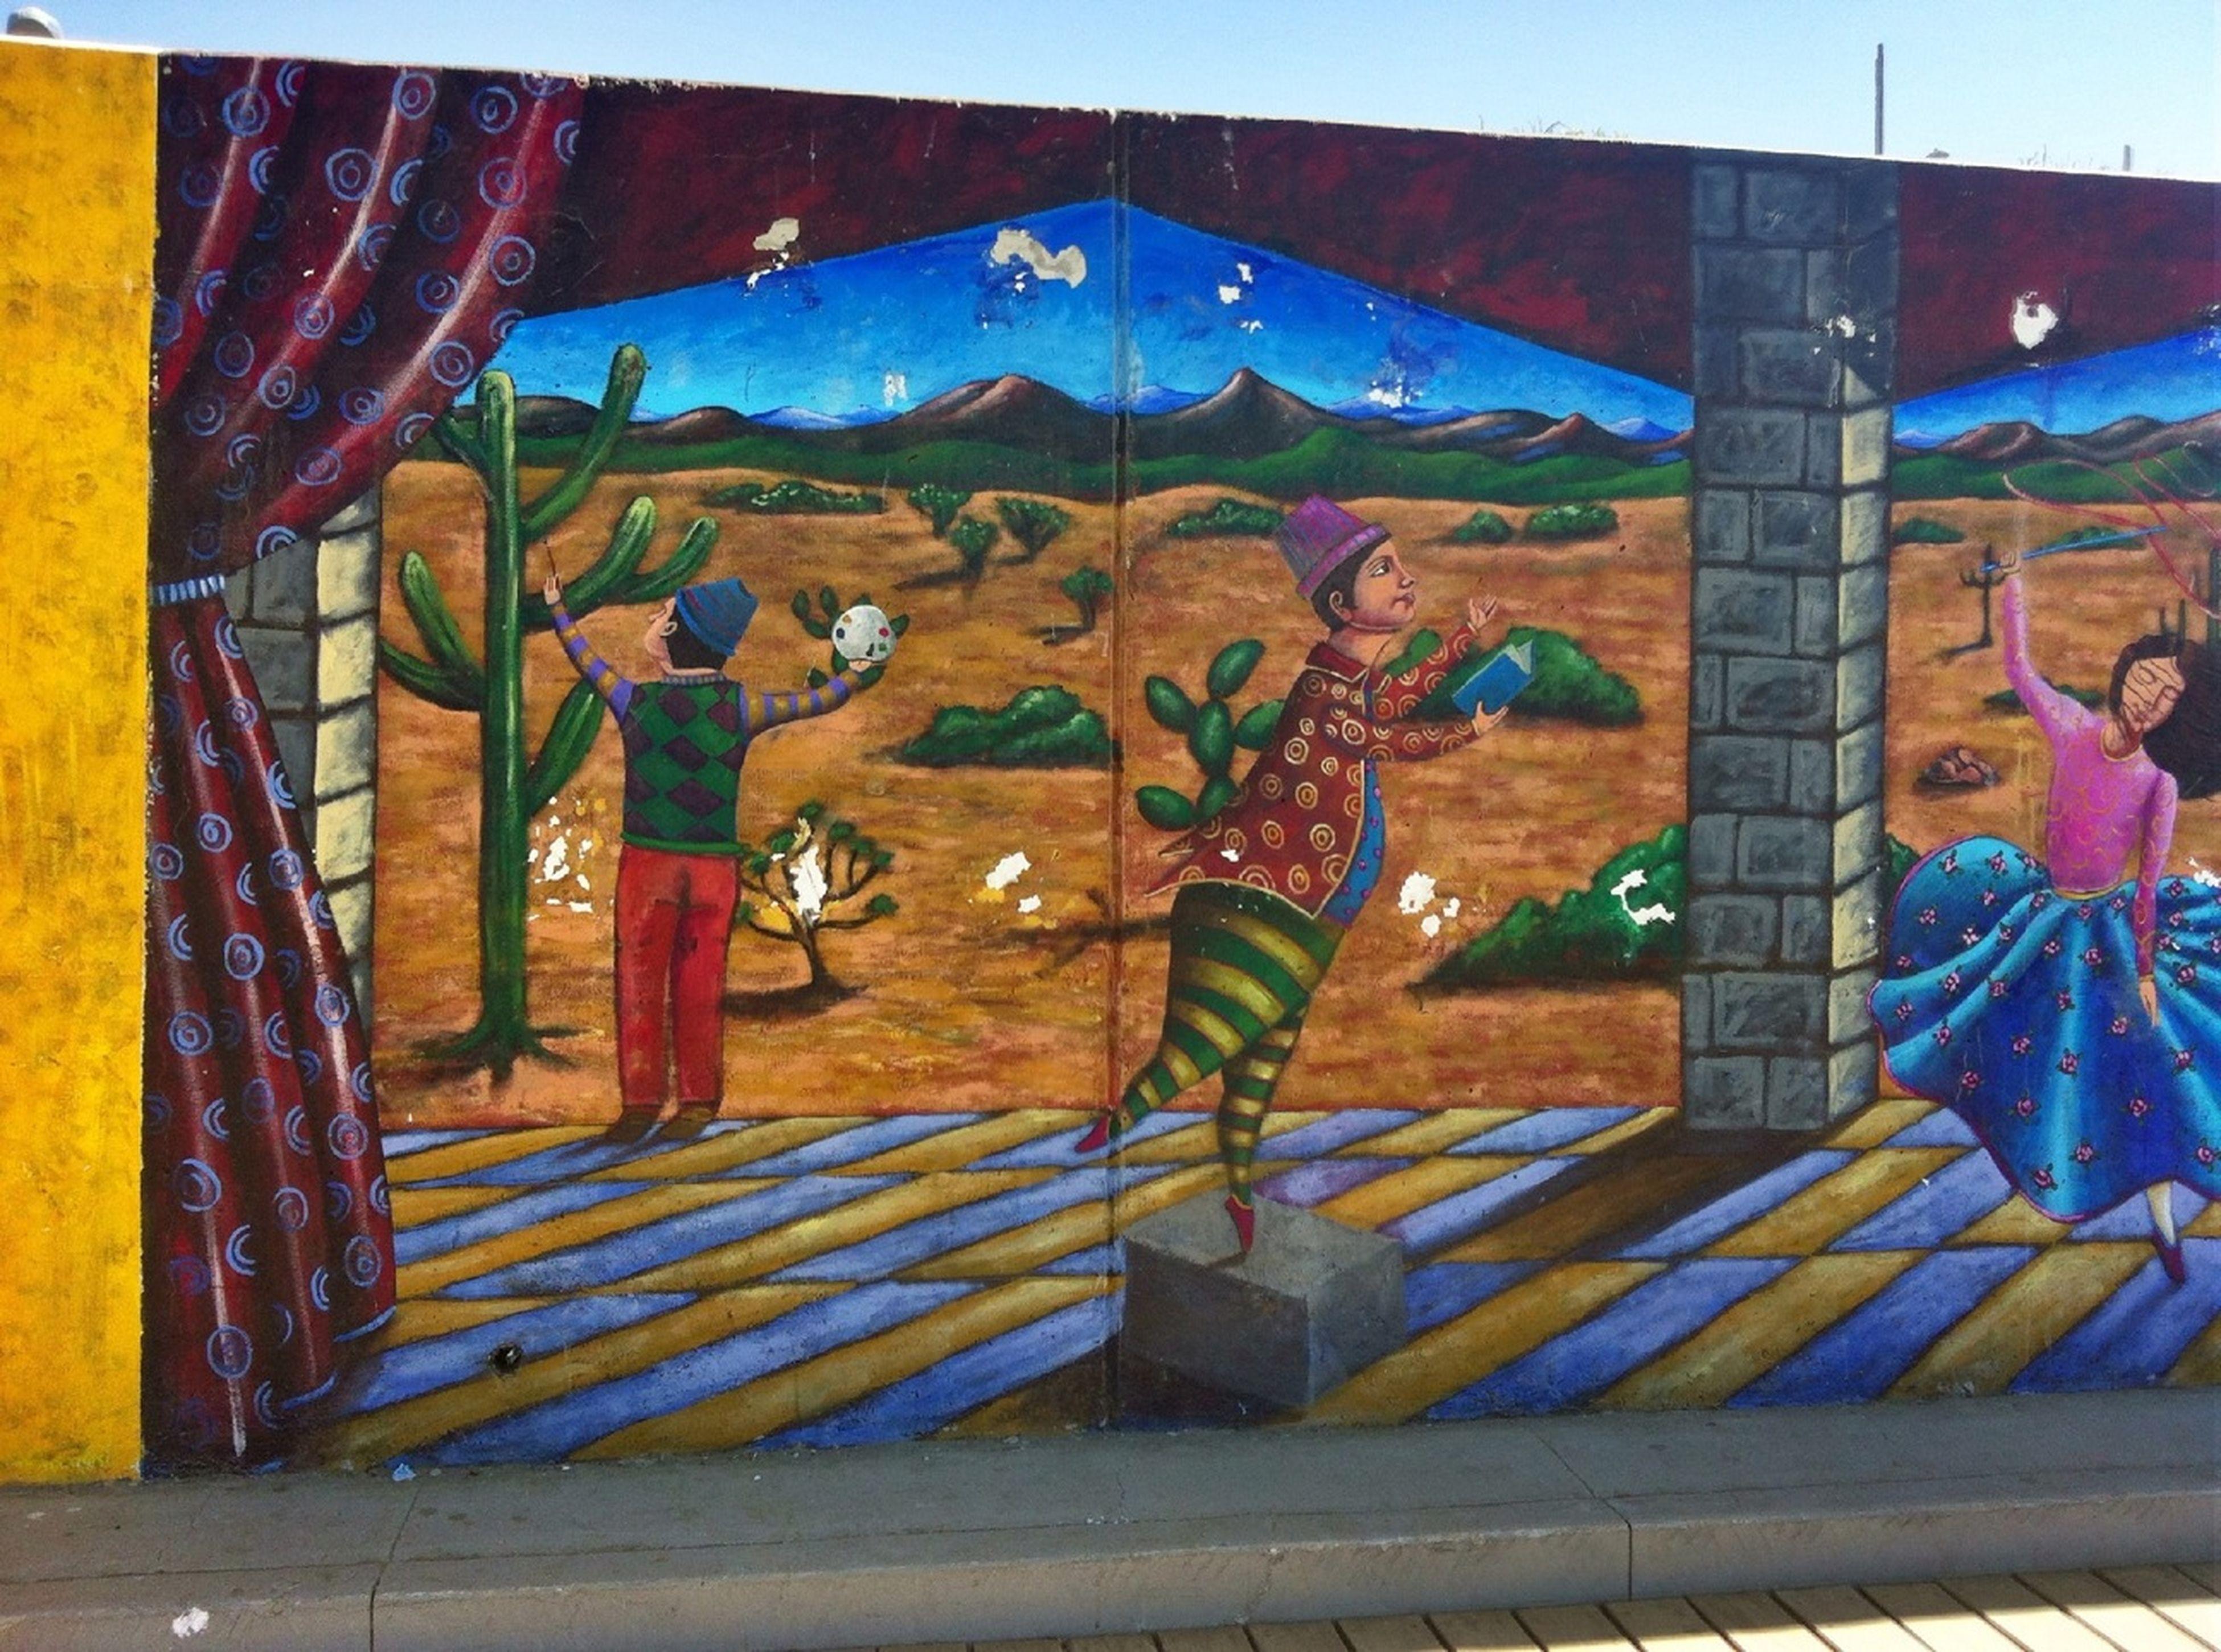 art, art and craft, creativity, graffiti, built structure, architecture, building exterior, human representation, blue, animal representation, sunlight, multi colored, sculpture, wall - building feature, shadow, day, street art, outdoors, statue